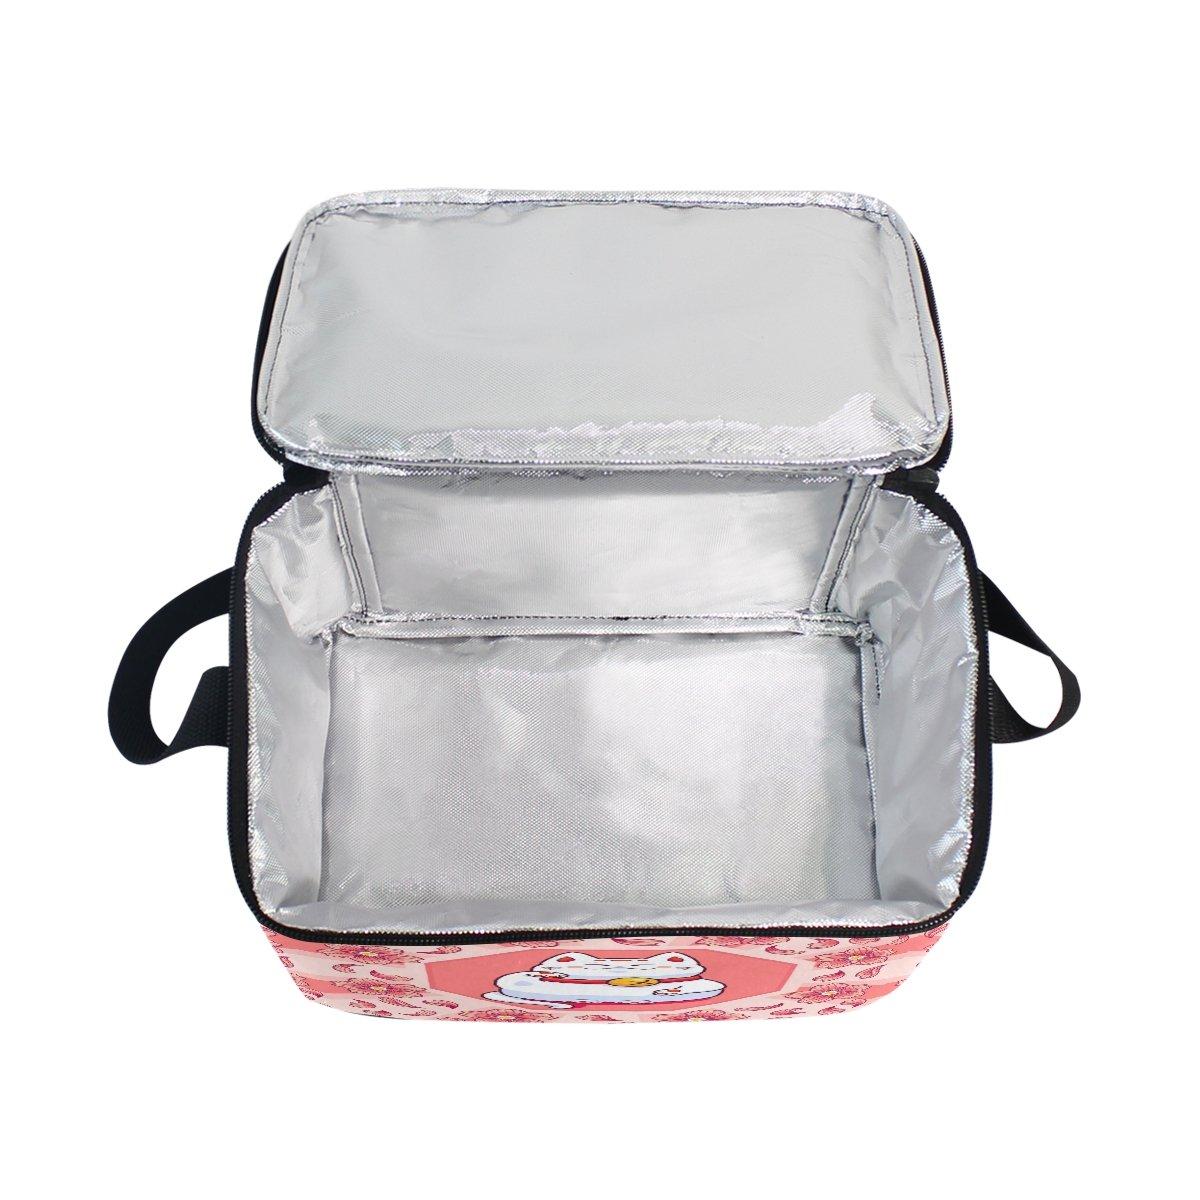 ALAZA Penguin Insulated Lunch Bag Box Cooler Bag Reusable Tote Bag Outdoor Travel Picnic Bag with Shoulder Strap for Women Men Adults Kids